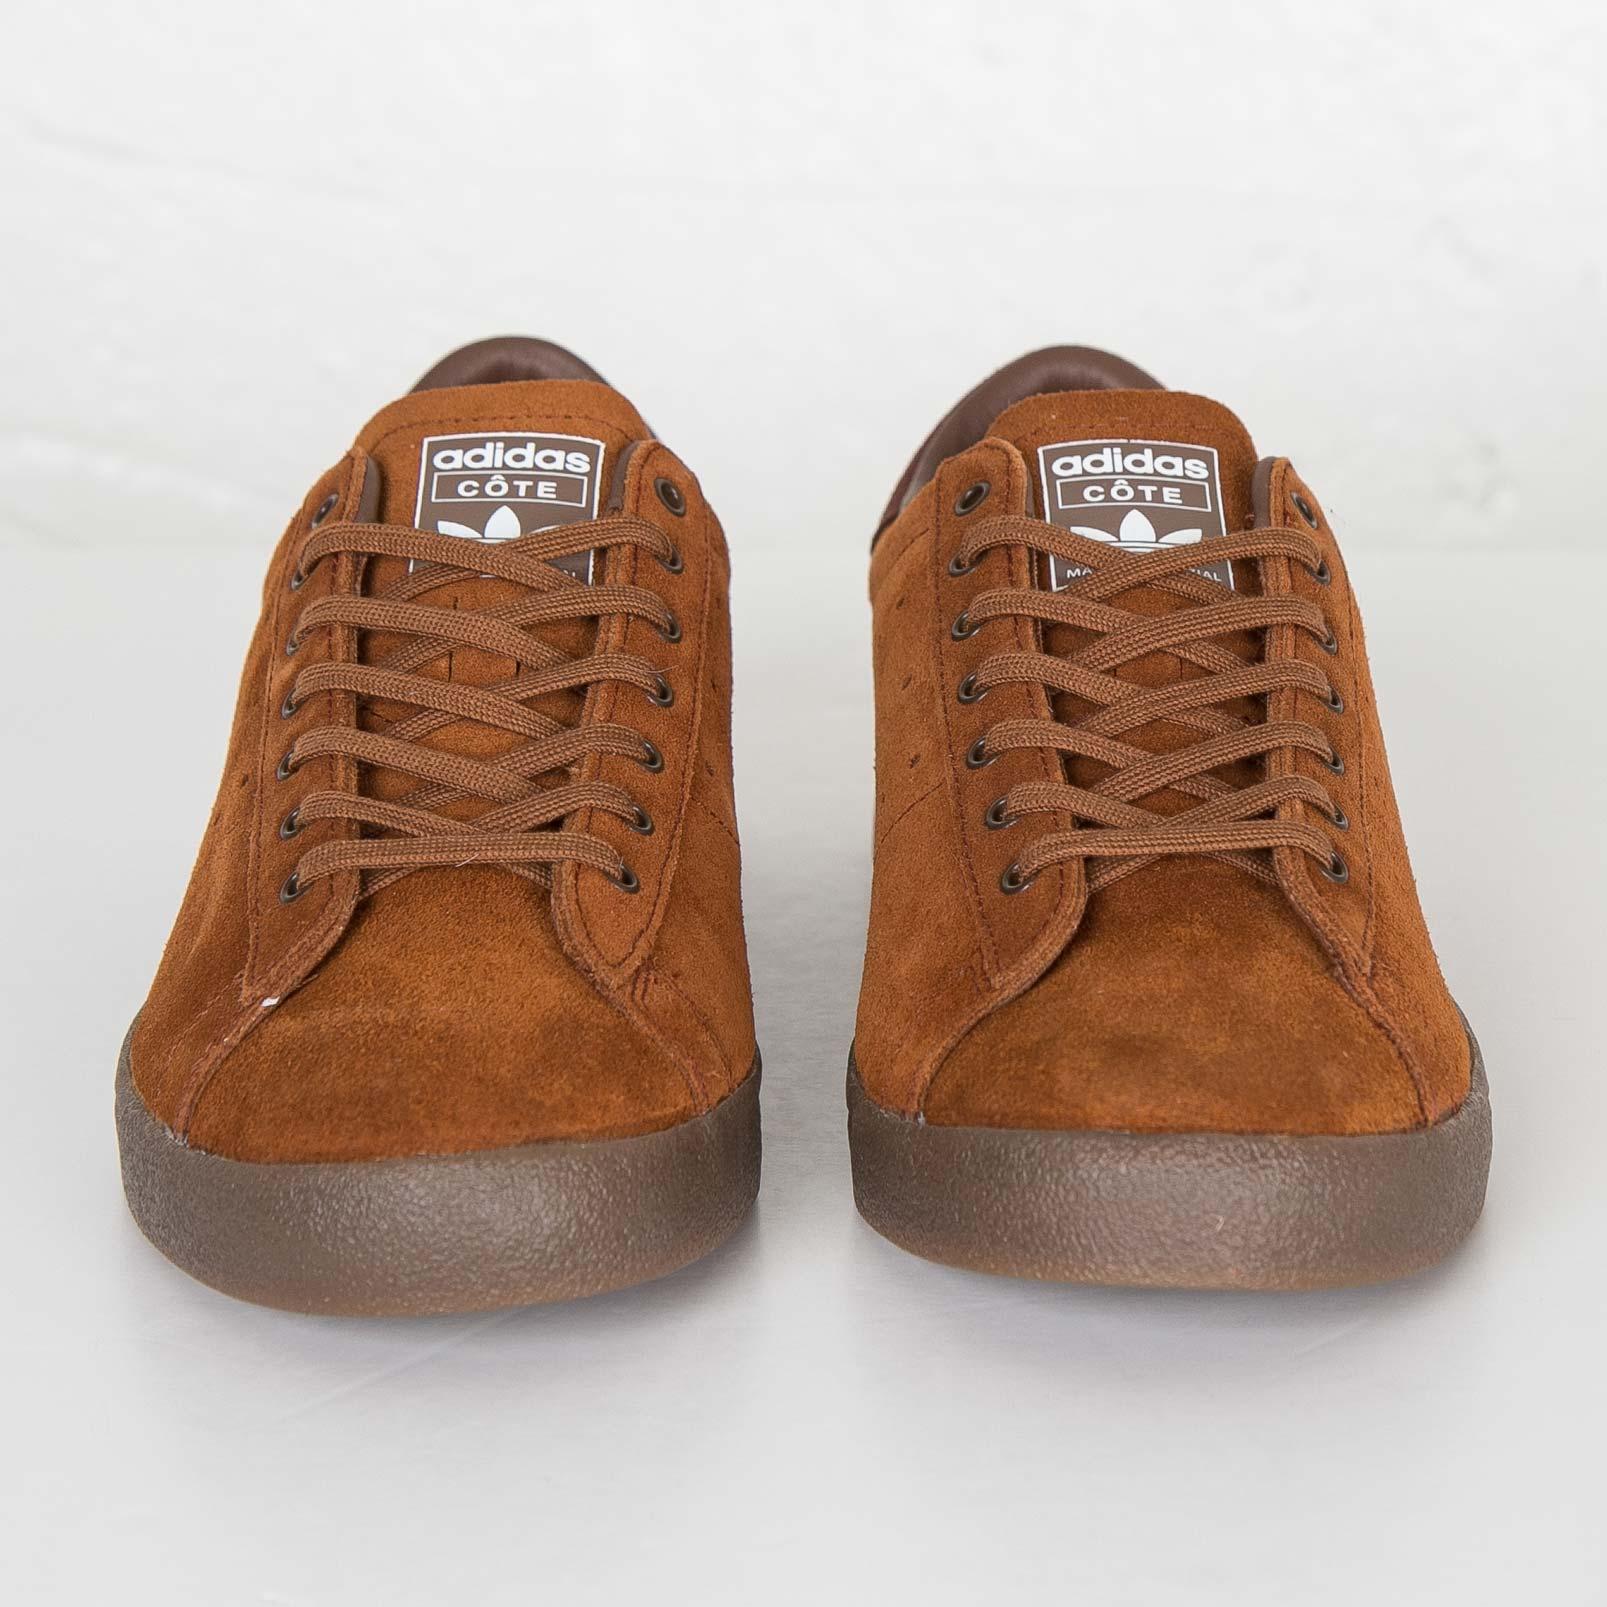 I Sneakersamp; Adidas Sneakersnstuff Spzl S74862 Streetwear Cote ZOPkuTXi